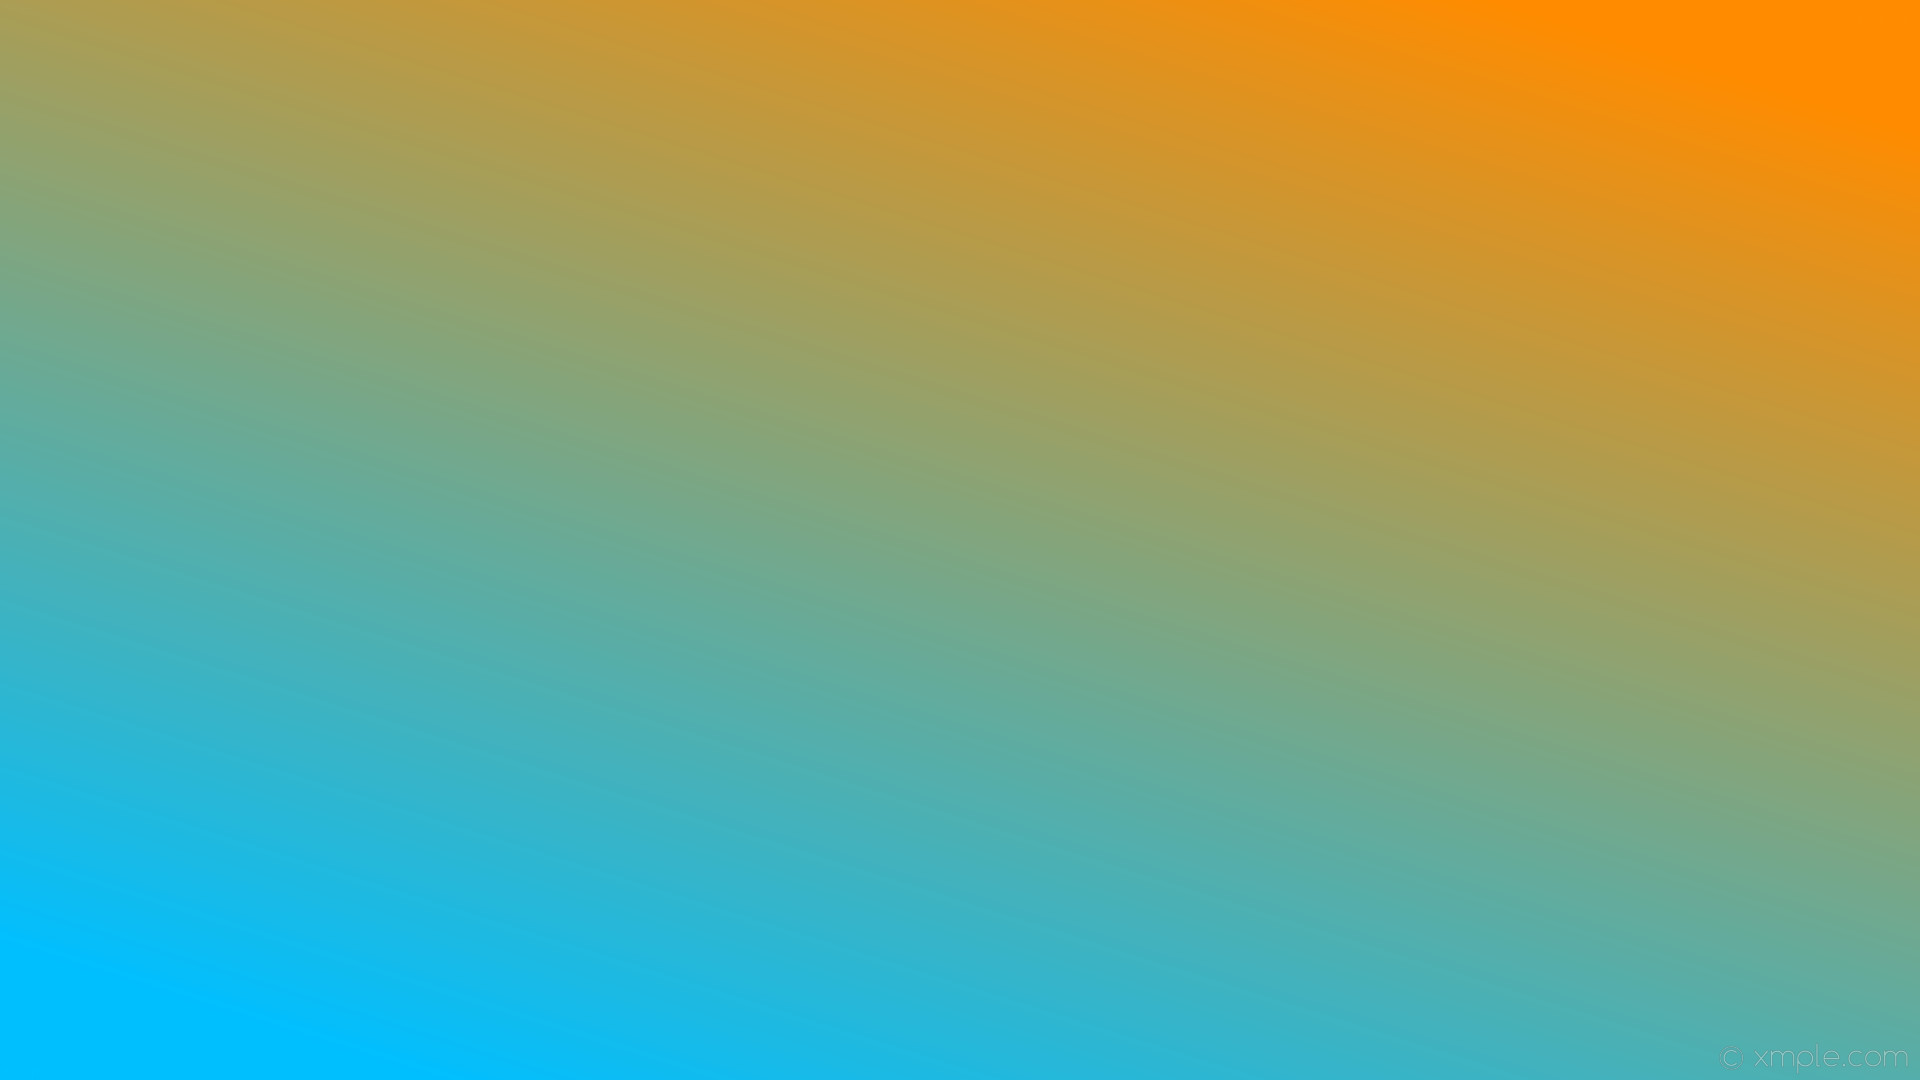 green orange blue